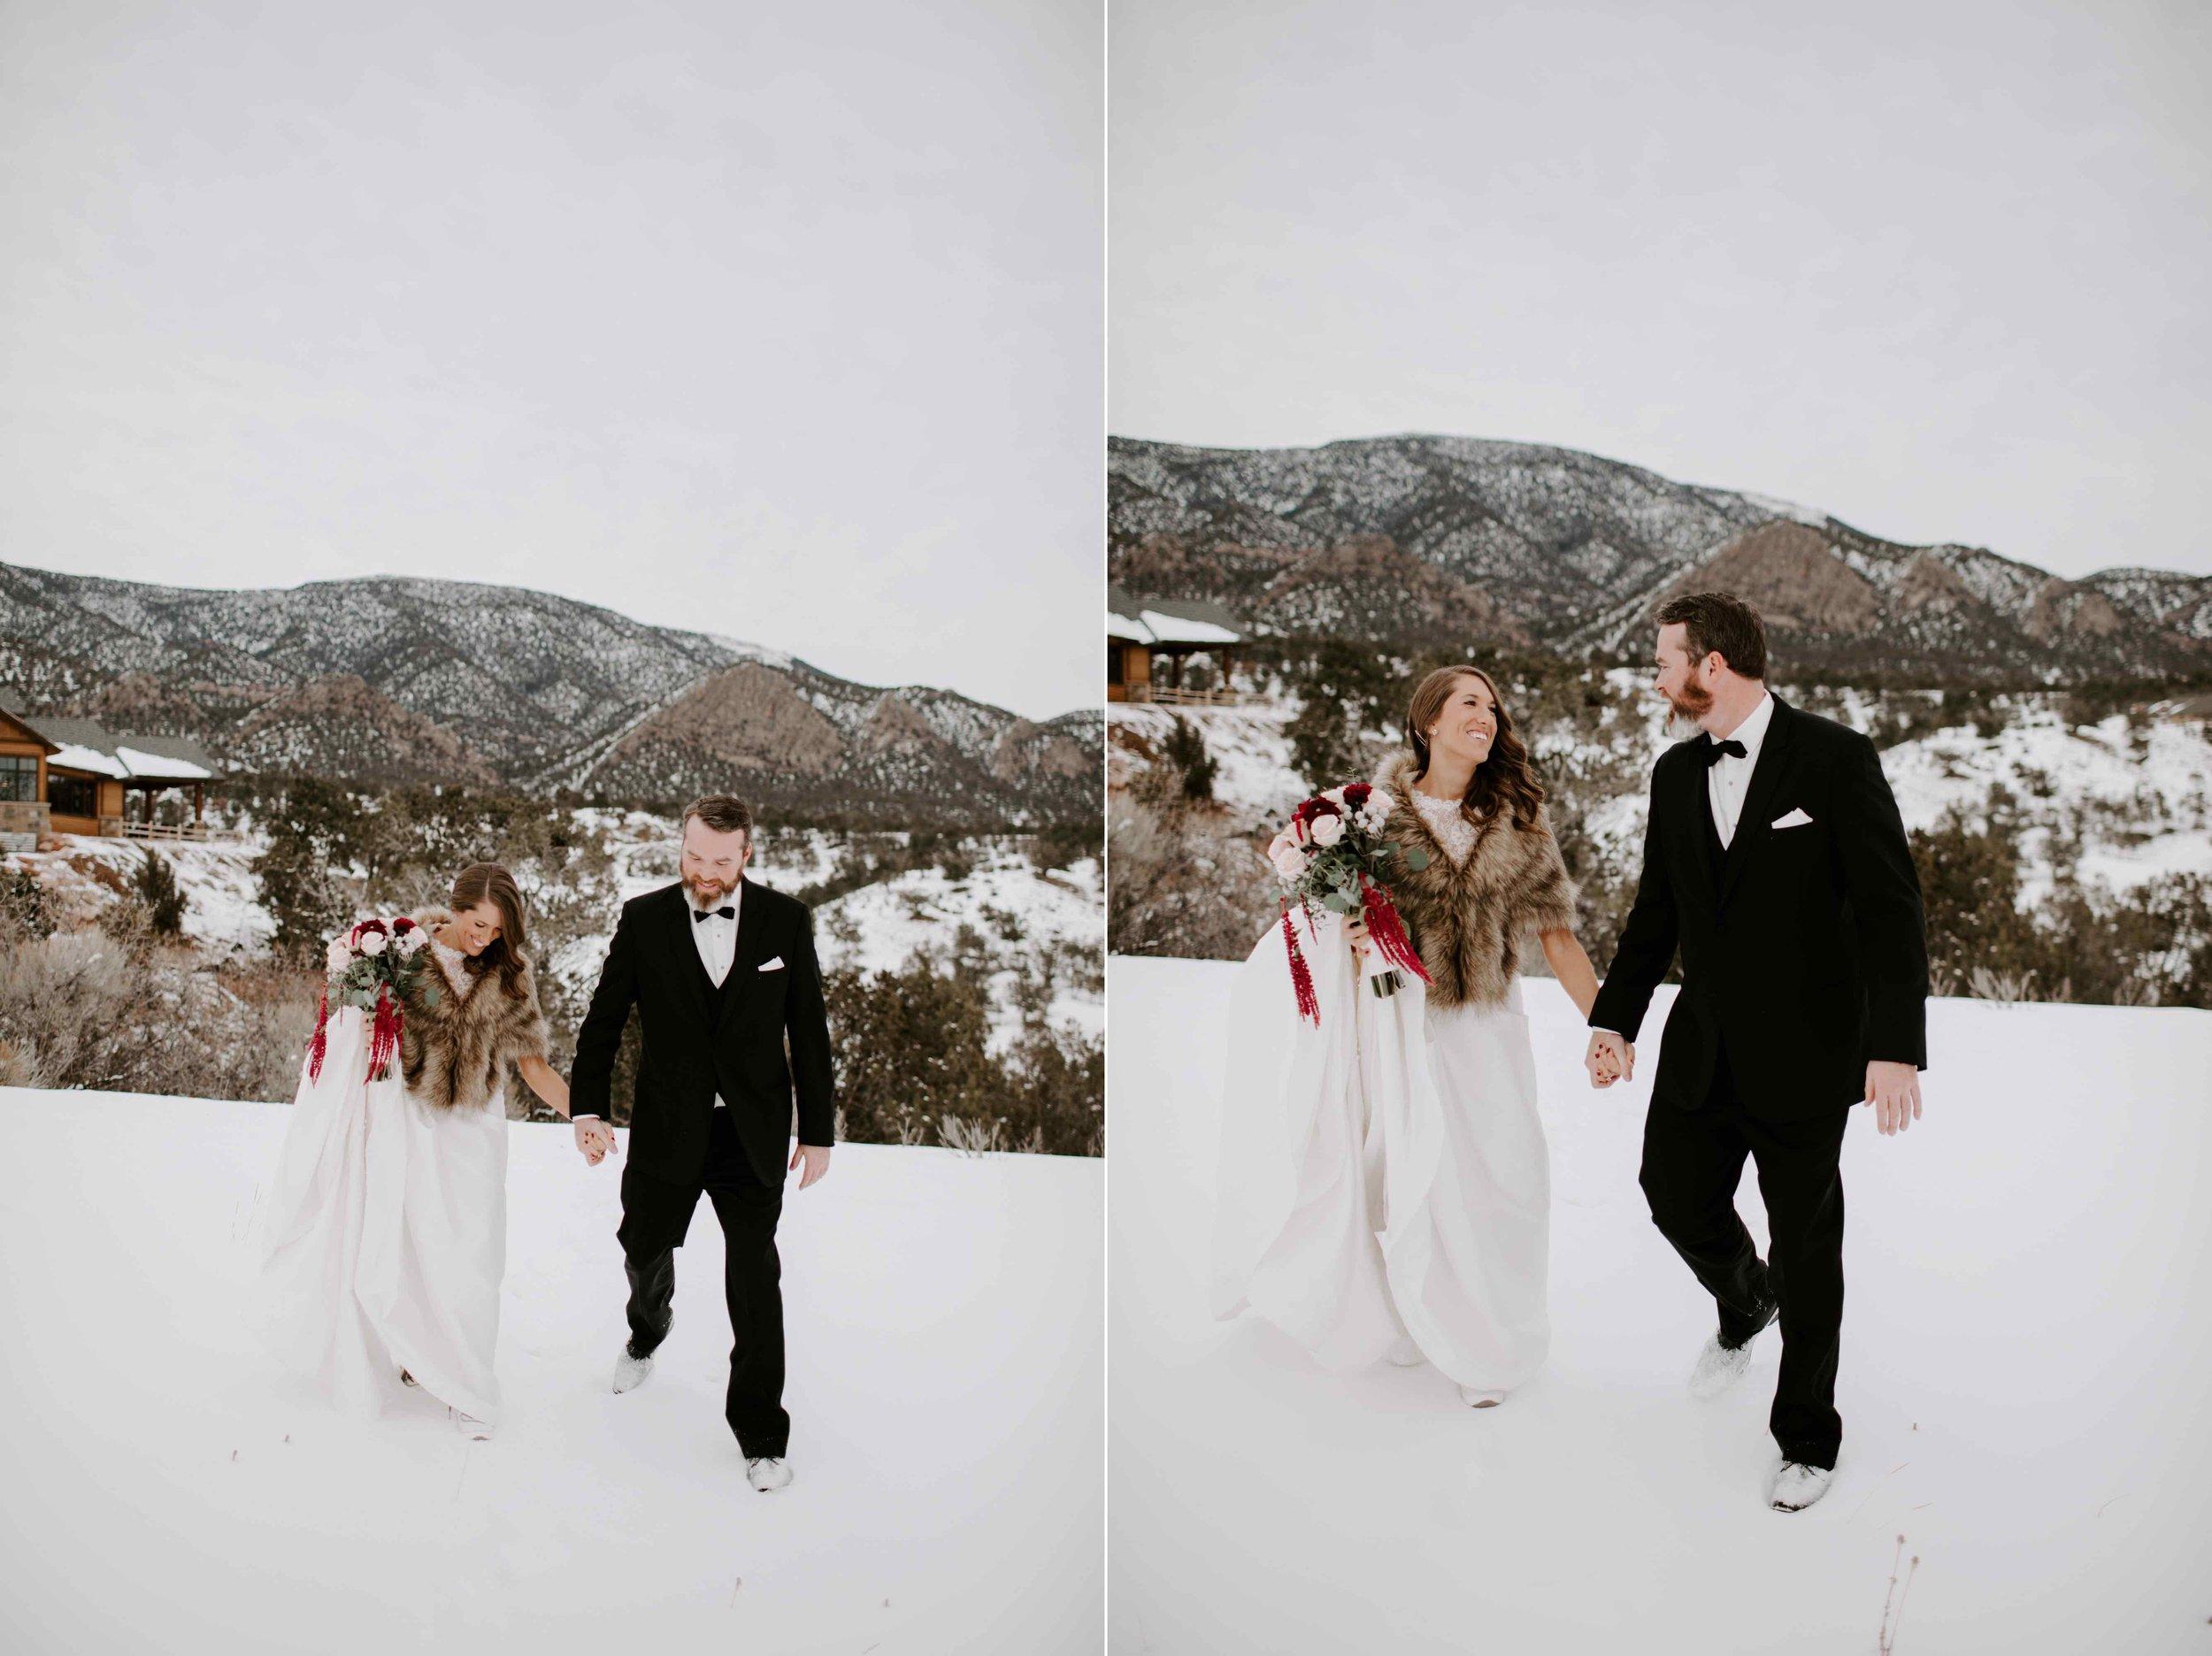 Kisa Conrad Favorites-0032-colorado-wedding-photographer-denver-springs-vailhotel-glenwood-springs-colorado-wedding-photographer.jpeg